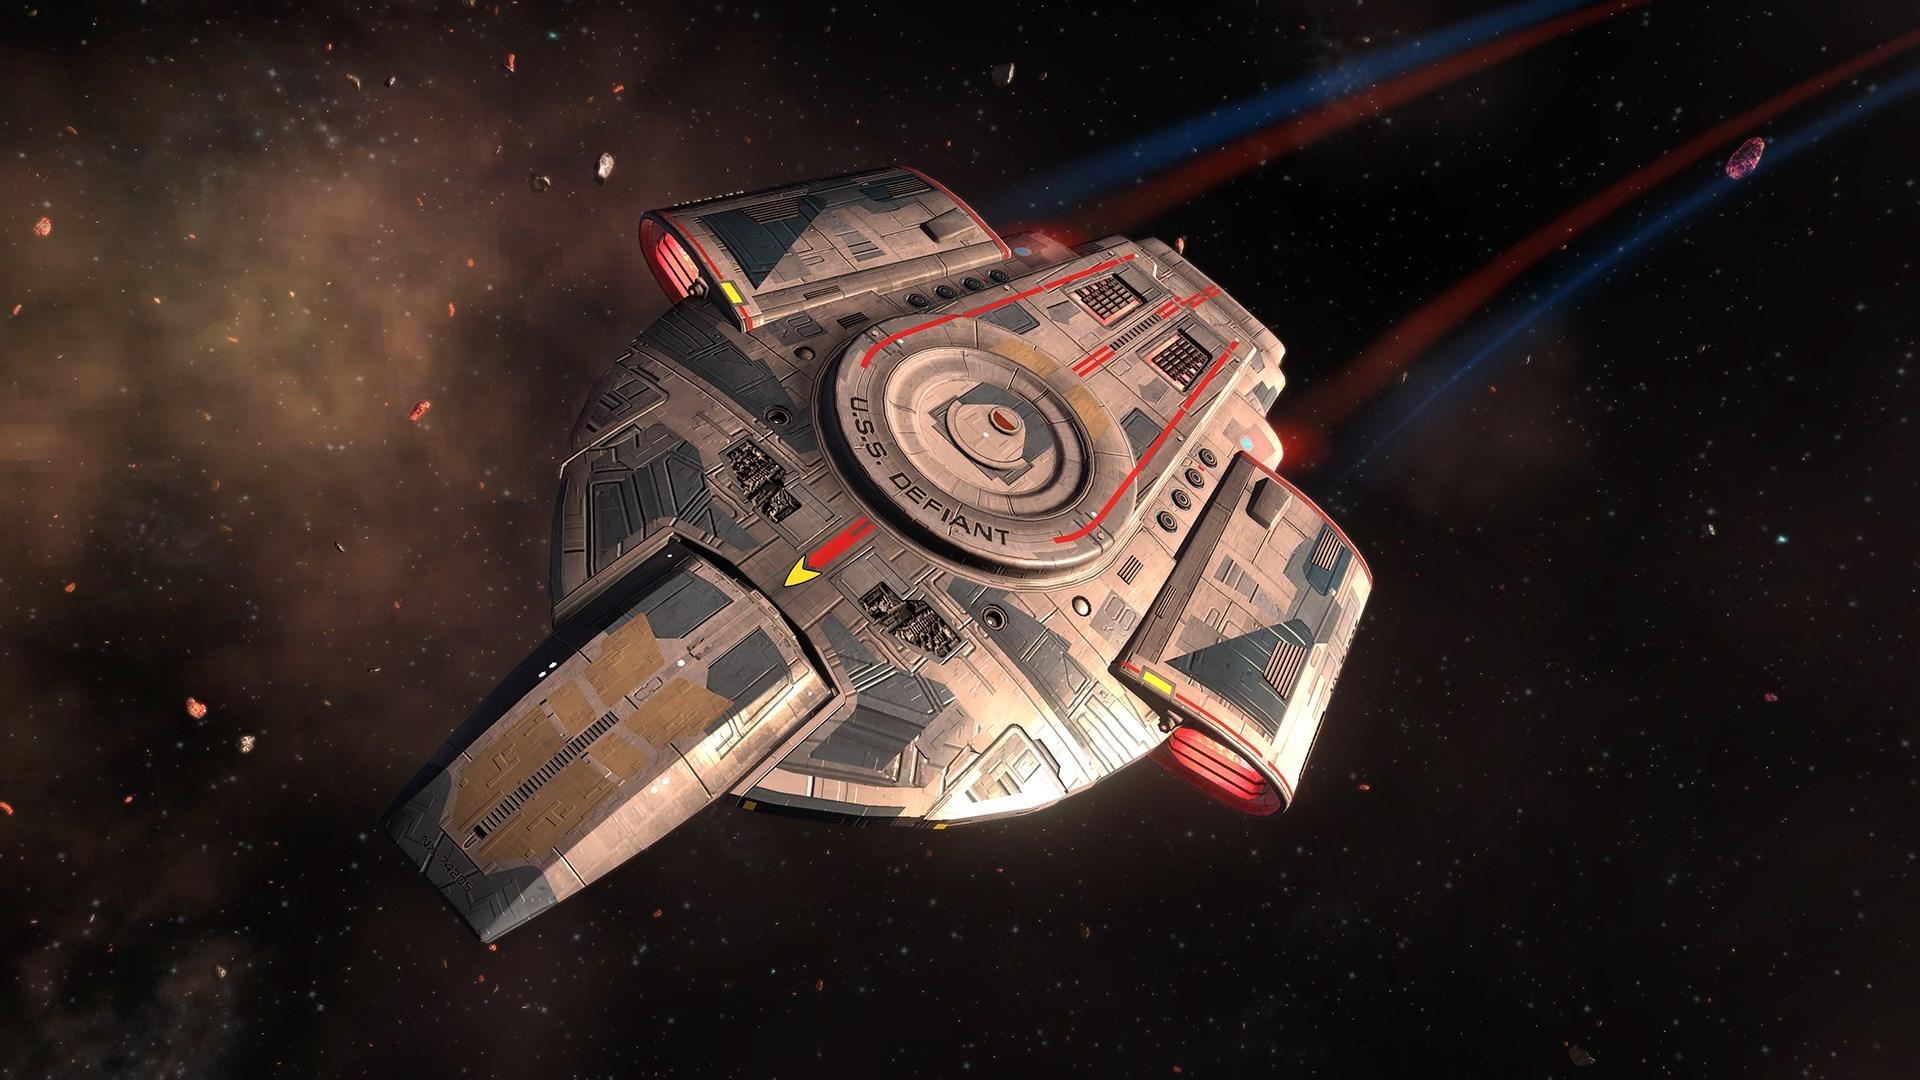 Spaceship Star Trek Online Rise Of Discovery Wallpaper Hd